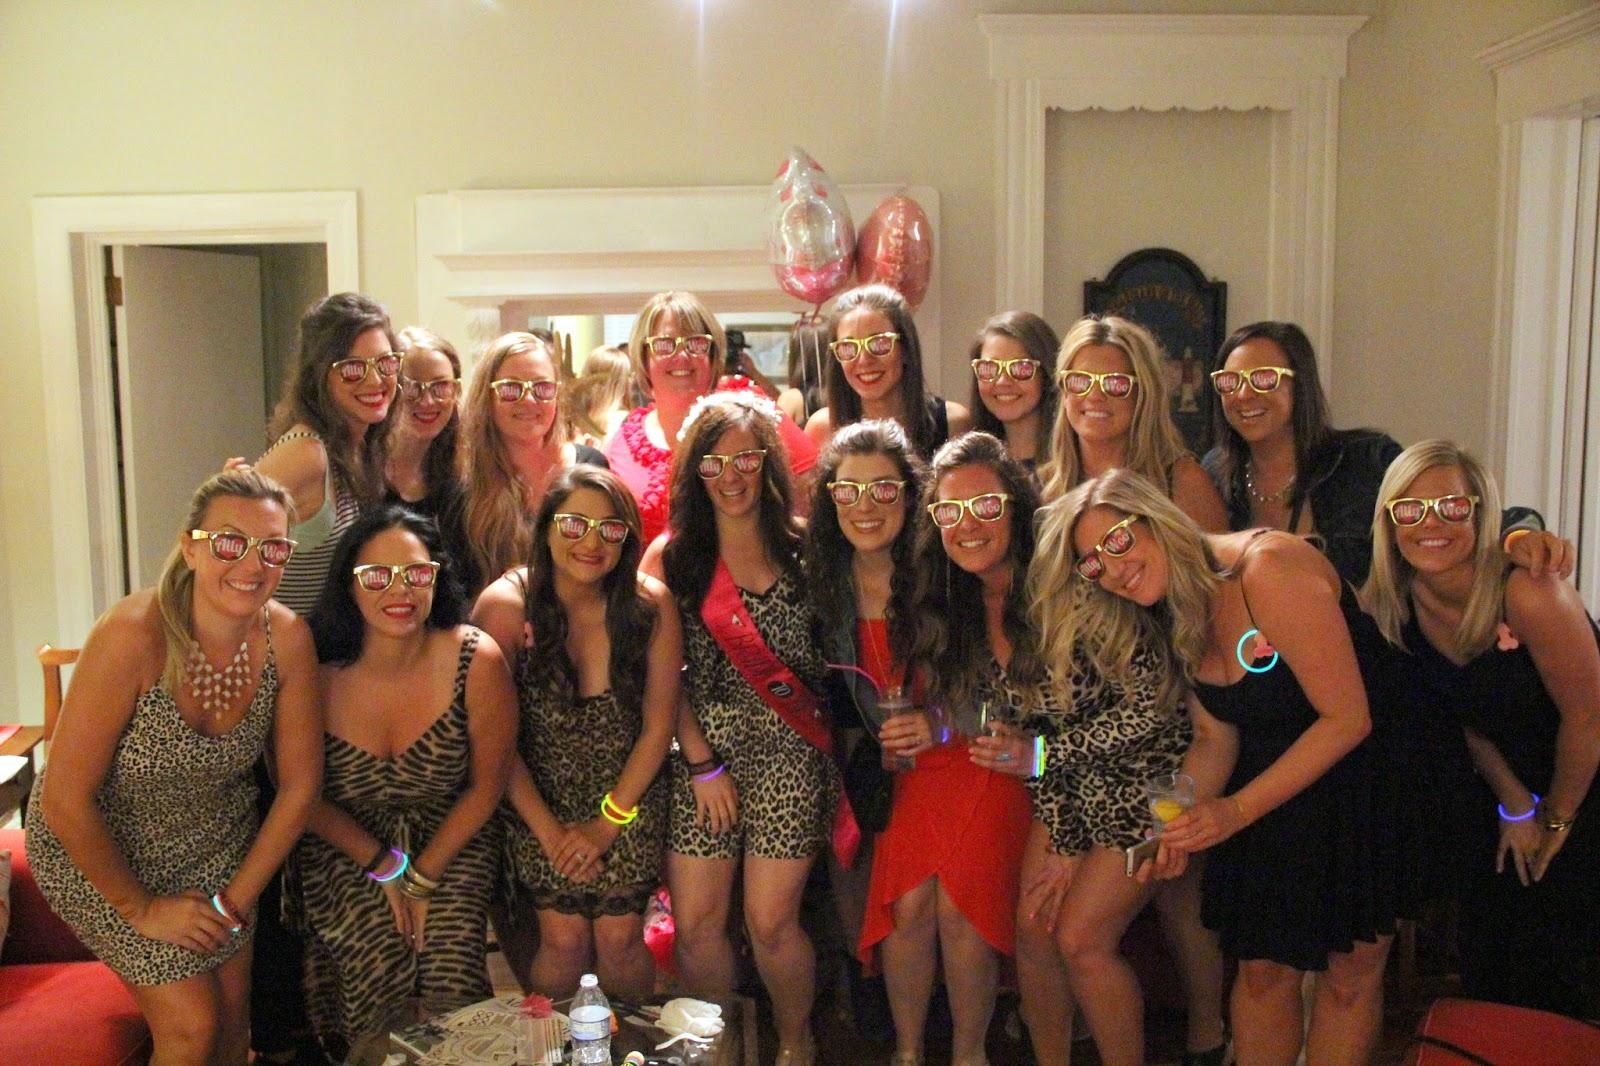 Atlantic city escorts bachlor party Services – Adore Entertainment